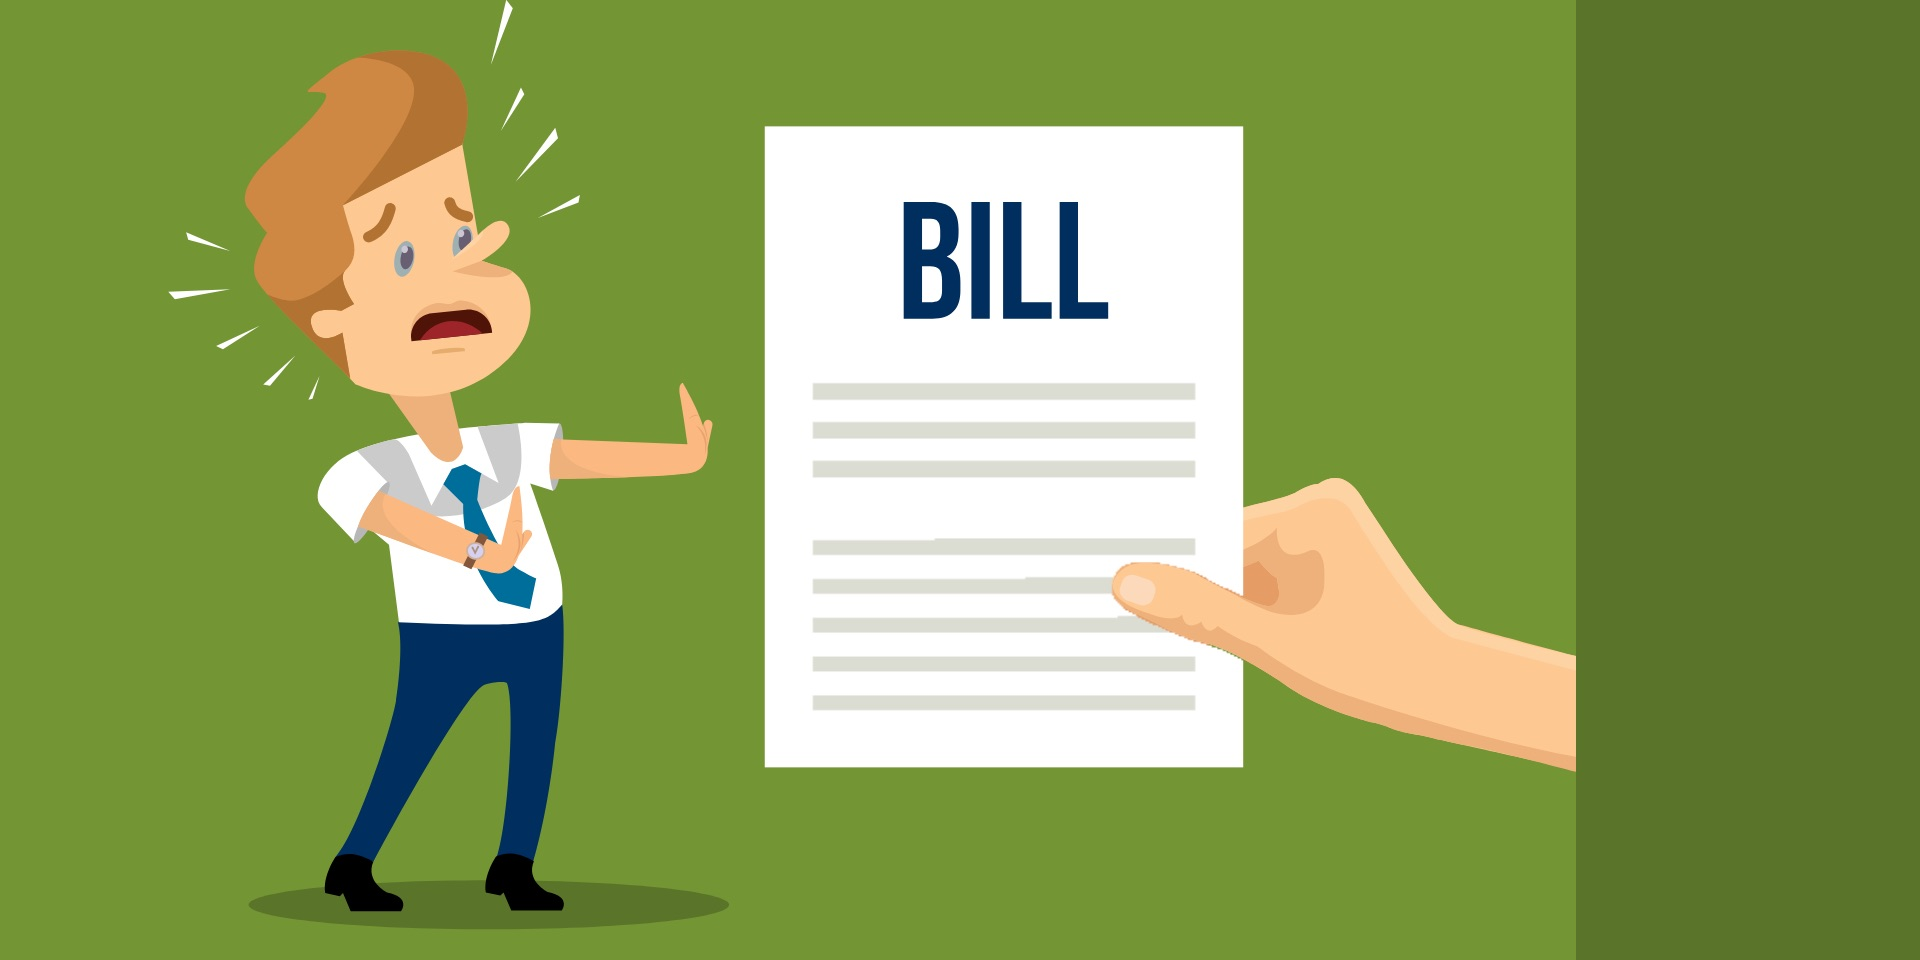 No-Surprises-Act-unexpected-medical bills-Bukaty-Hubsopt-Spring 2021